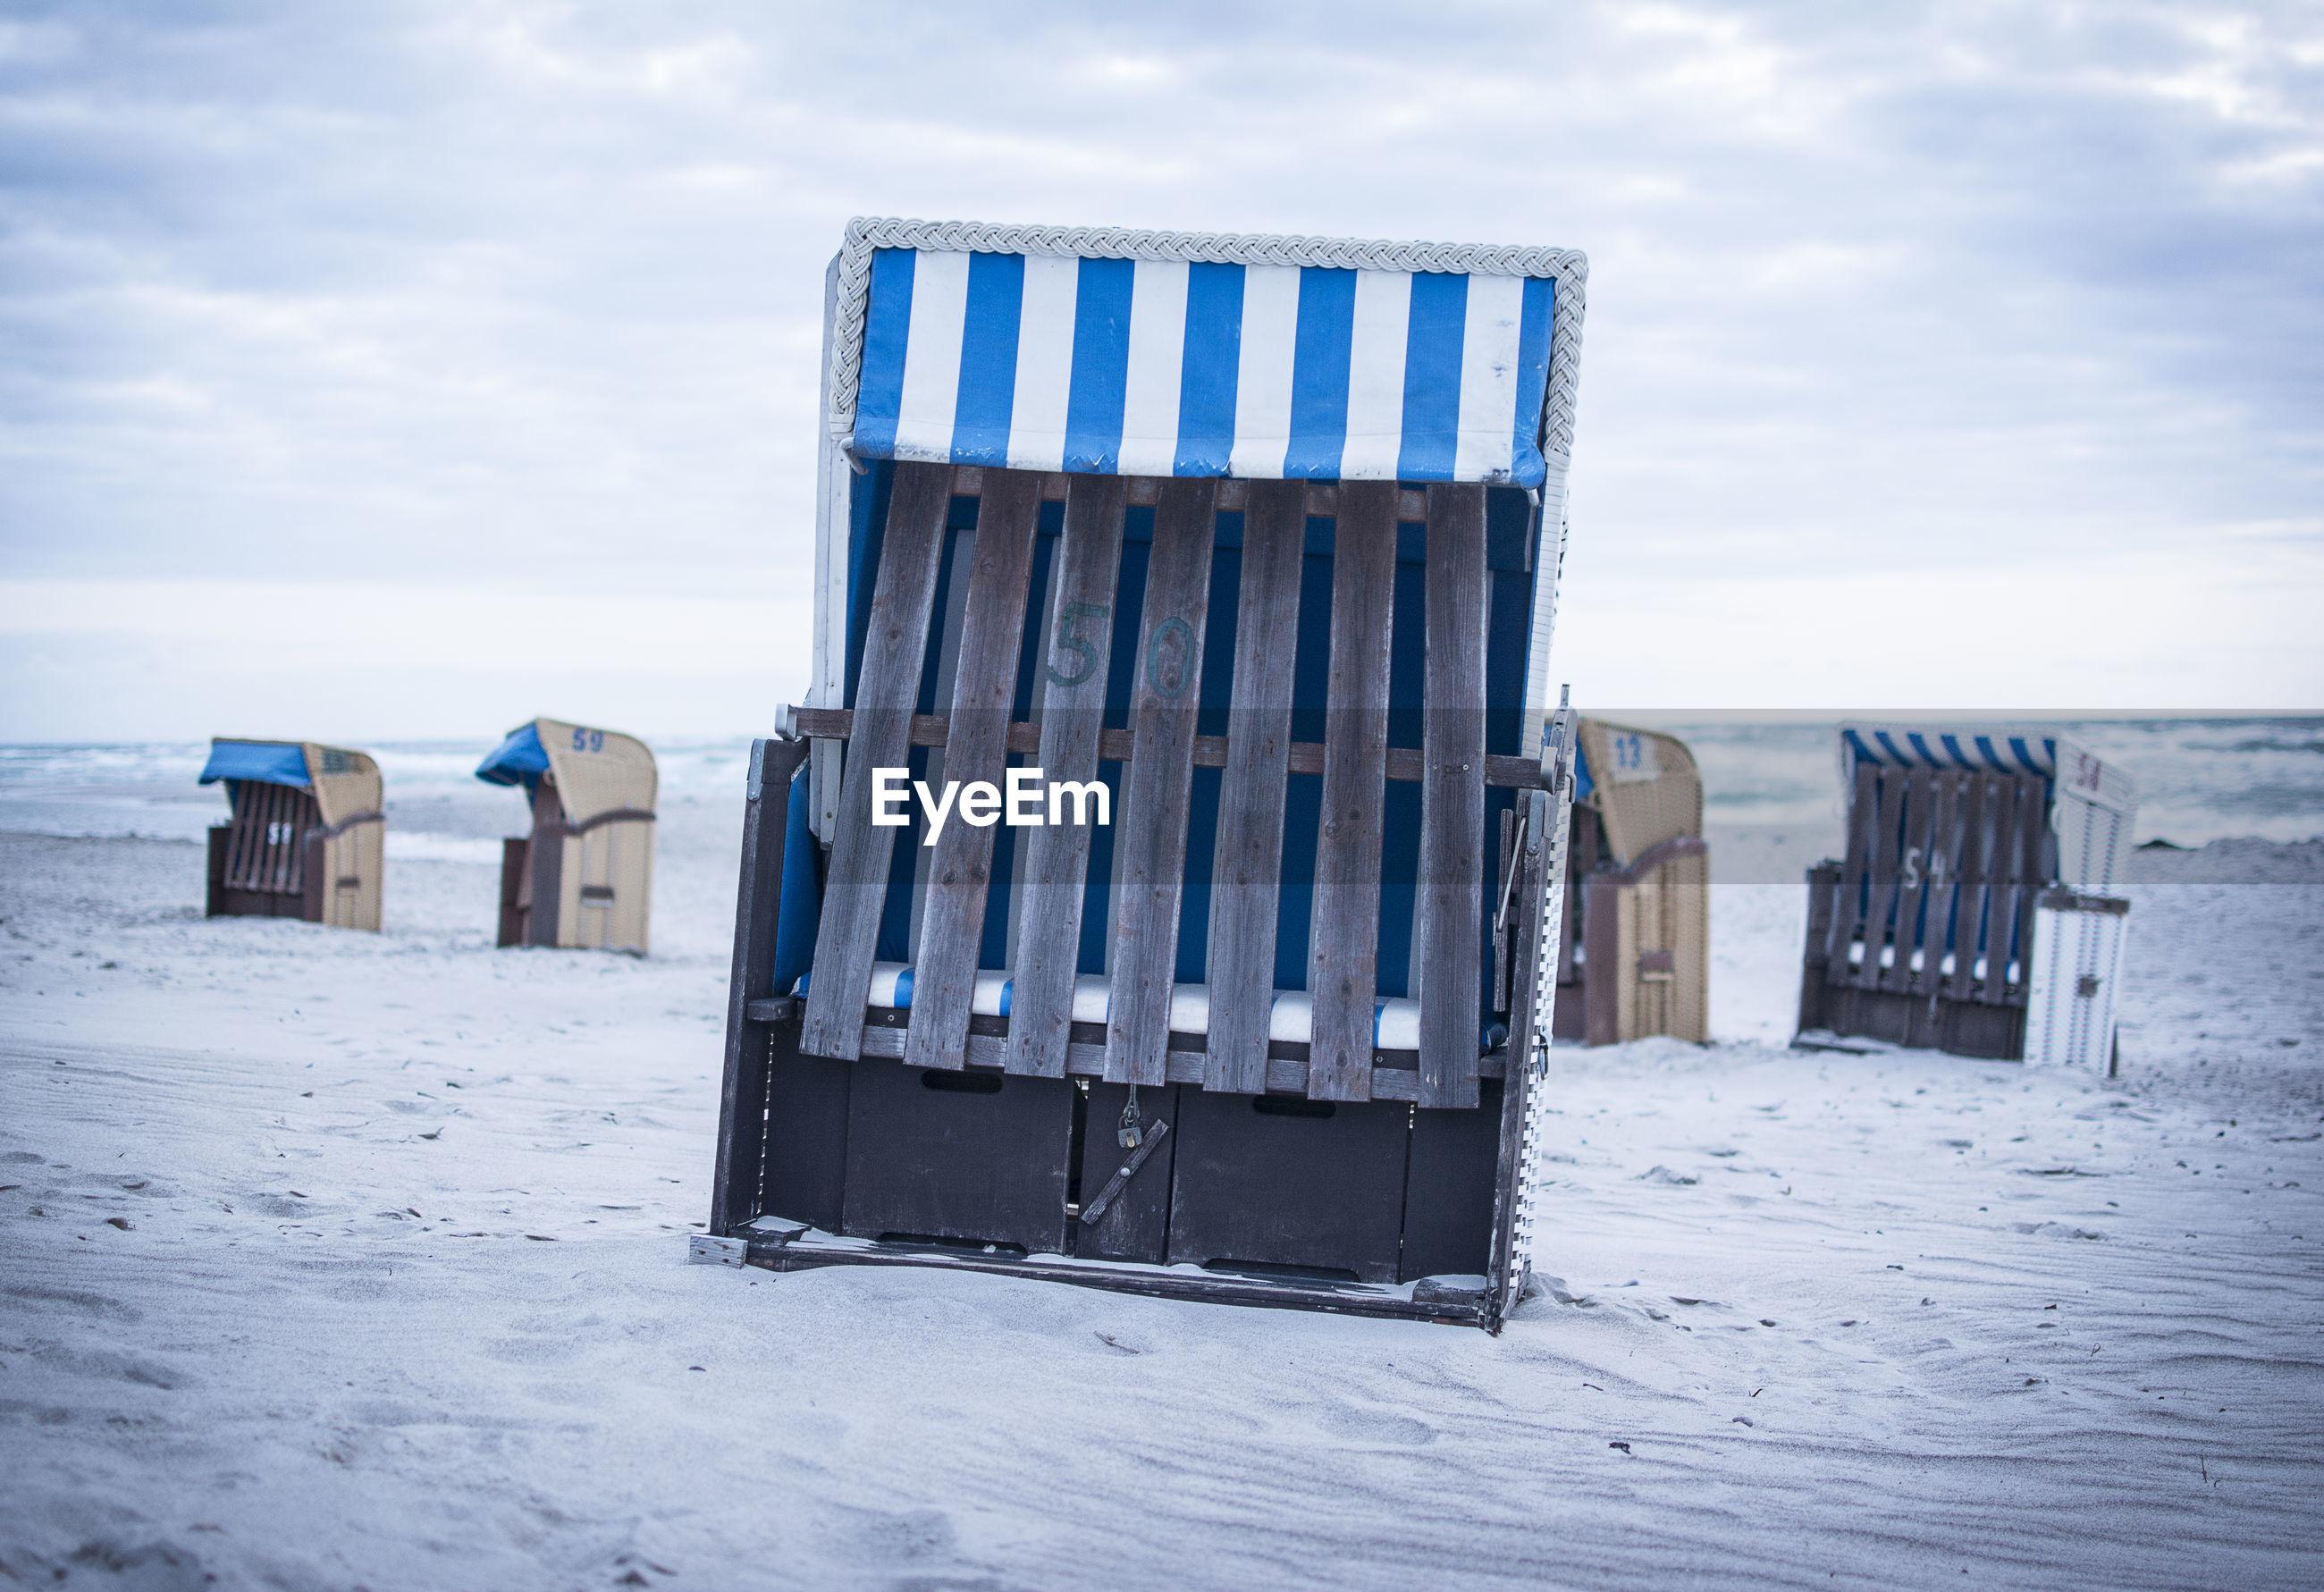 LIFEGUARD HUT ON BEACH DURING WINTER